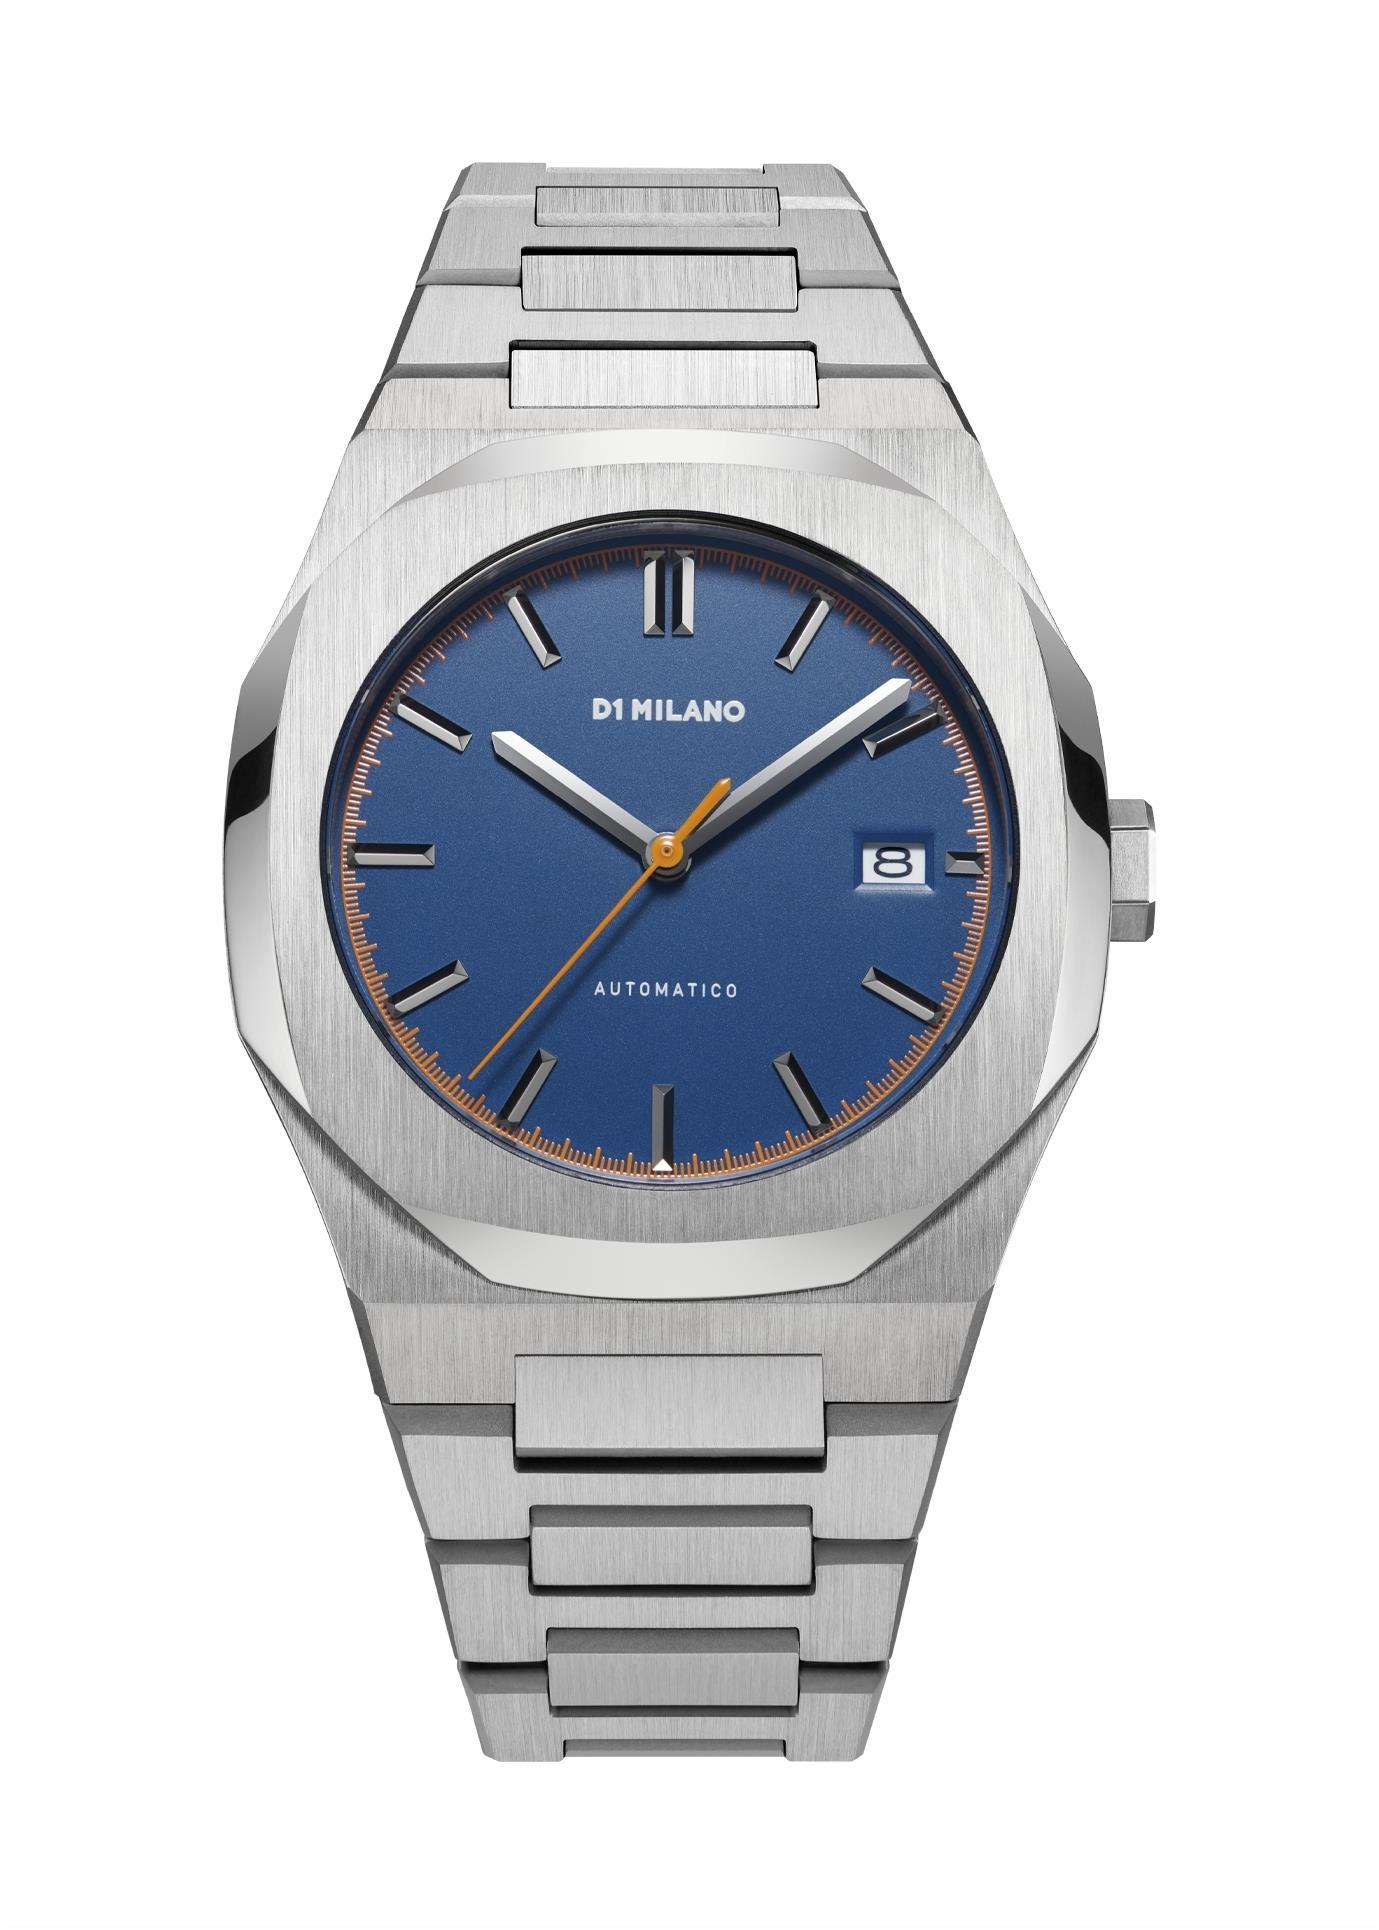 D1 MILANO Gents Wrist Watch Model ATLAS D1-ATBJ04